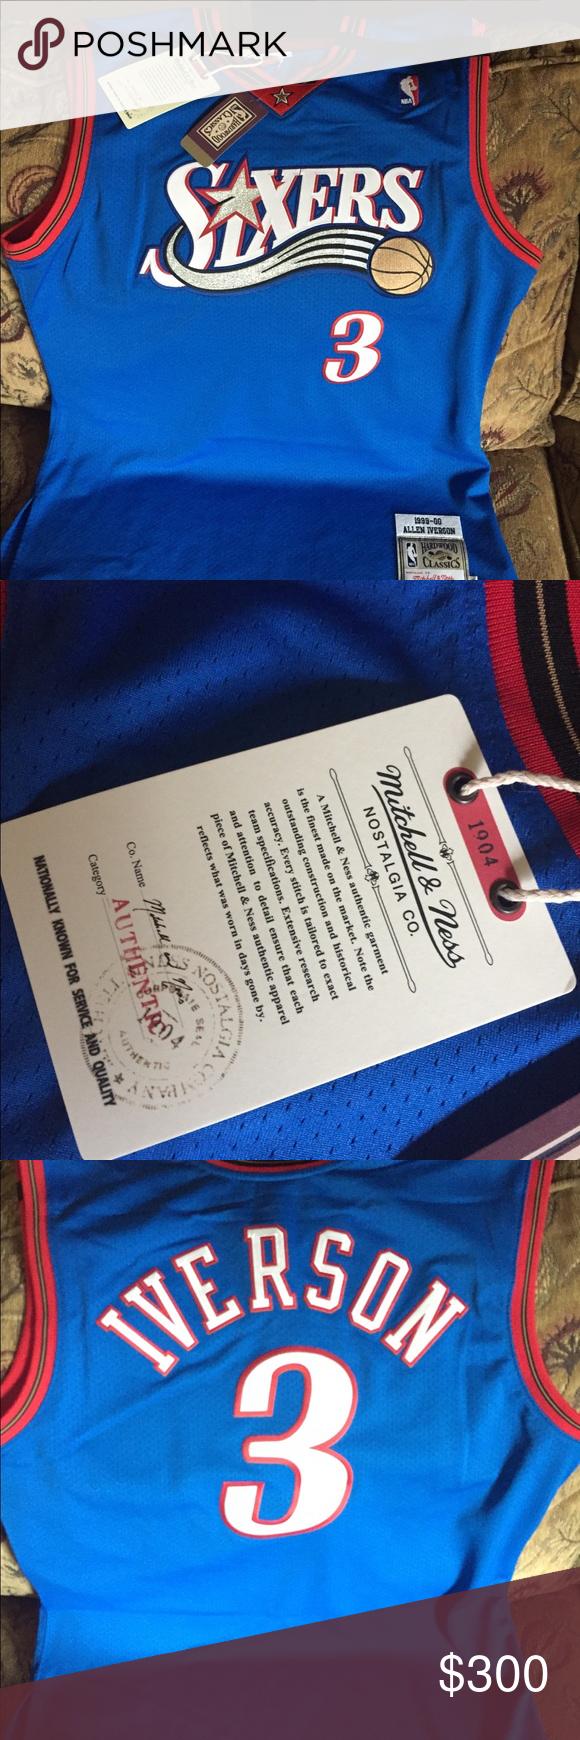 0c228741fbf NBA 🏀🏀🏀🏀 Allen Iverson Jersey Authentic Allen Iverson Philadelphia  76ers Mitchell & Ness Road 1999/2000 Hardwood Classics Authentic Jersey -  Royal size ...